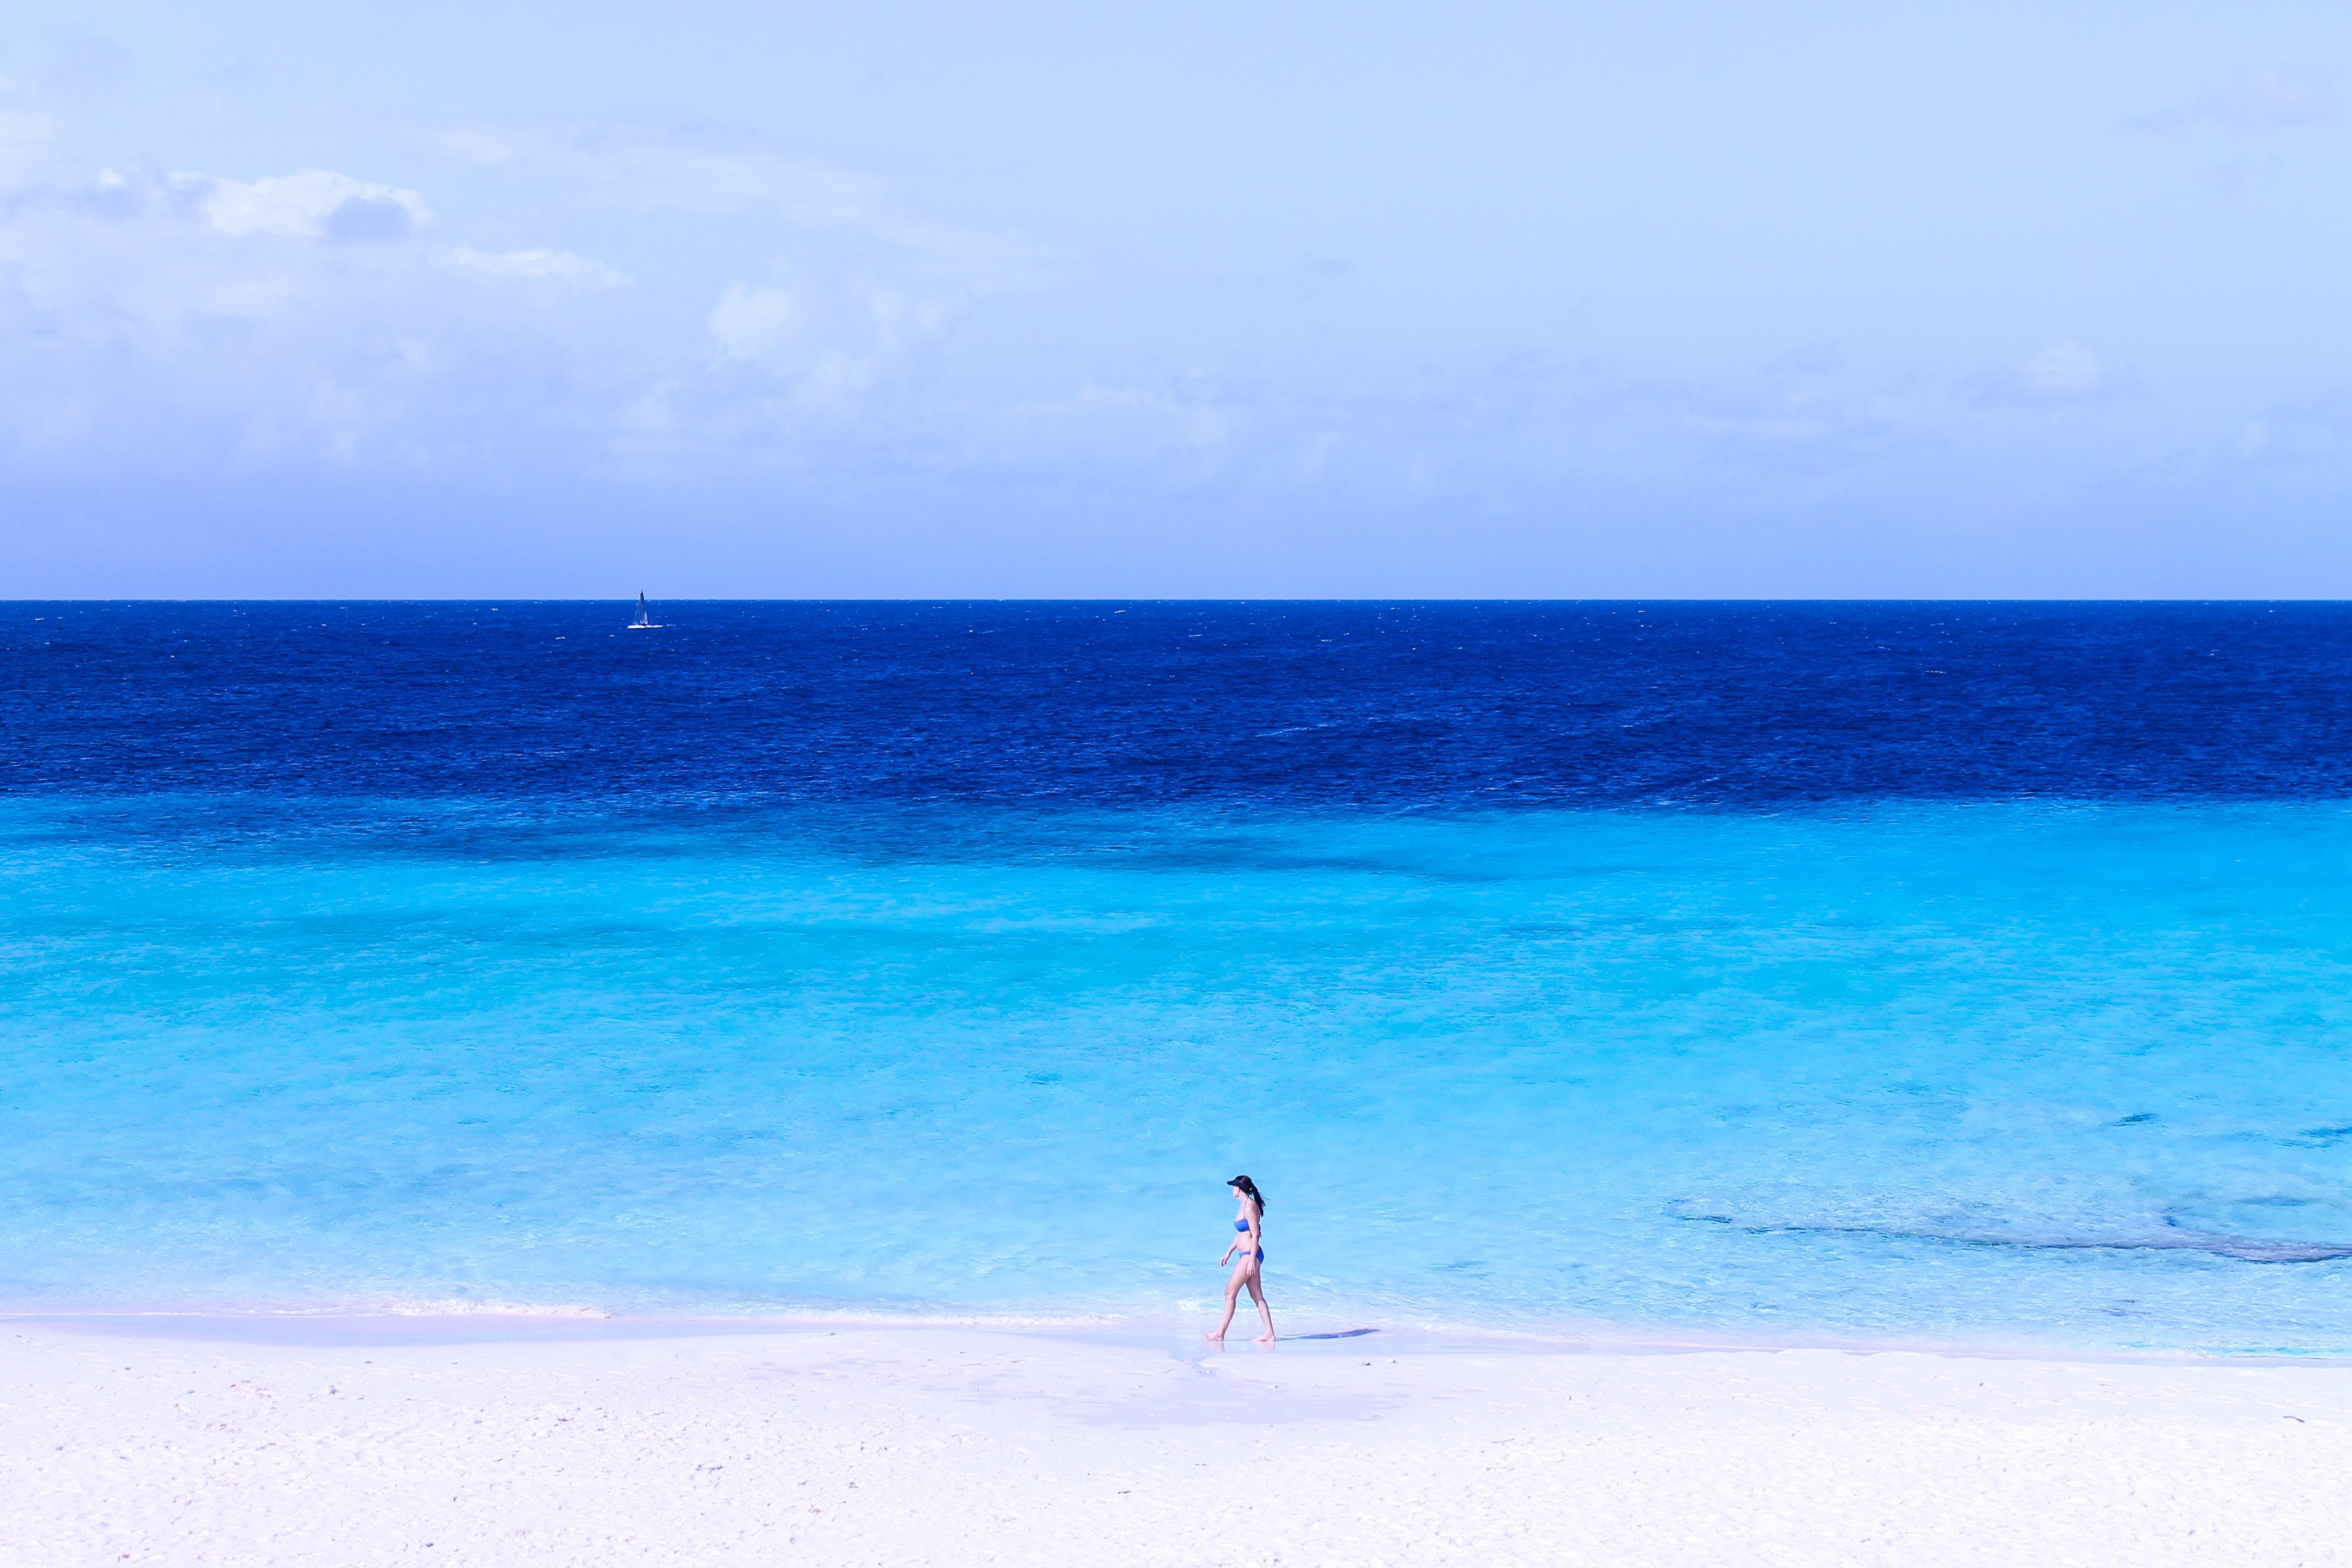 woman walking on seashore